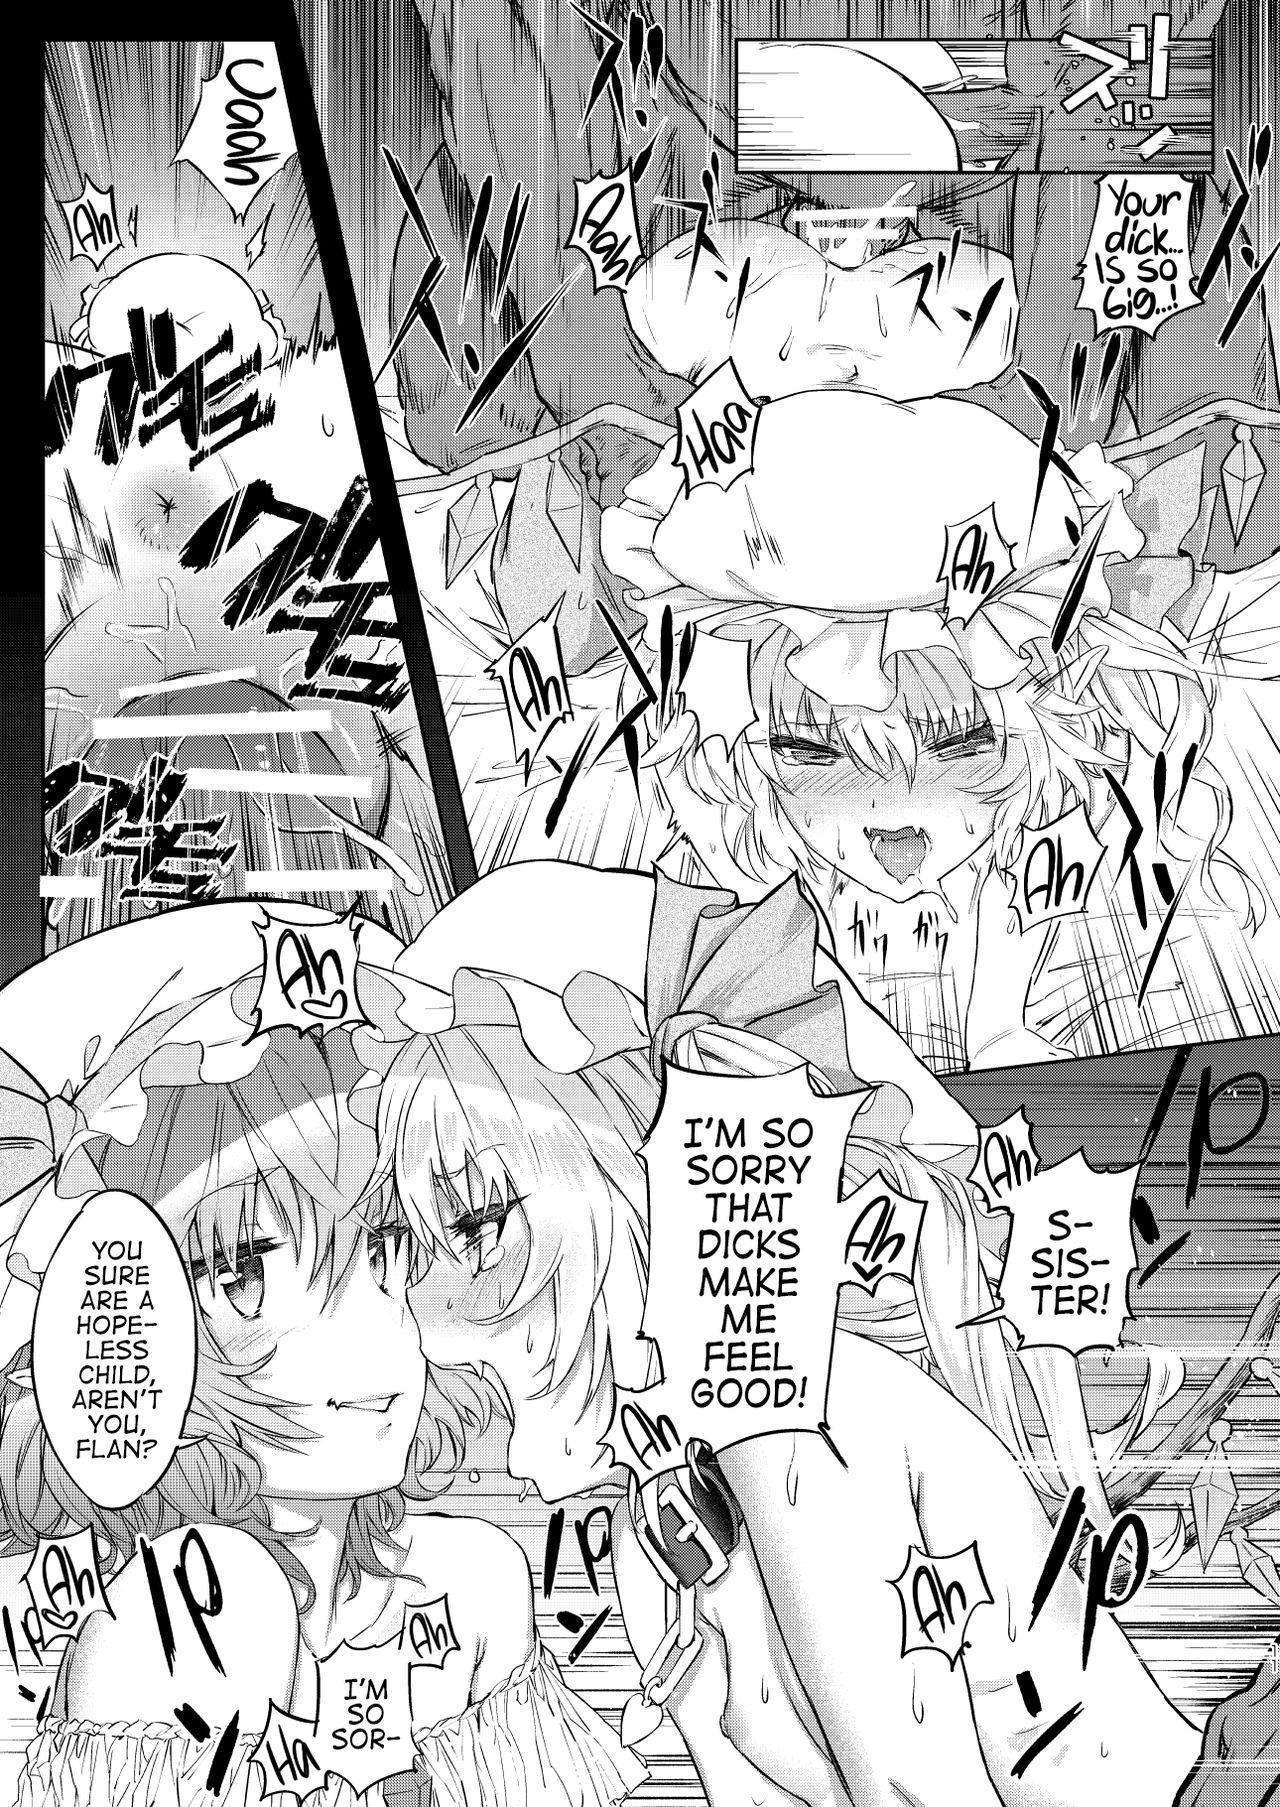 Watashi wa Shitsuke no Tame ni Flan o Otoko-domo ni Naburaseru | I'm letting a group of men torment my little sister Flan in order to teach her manners. 9